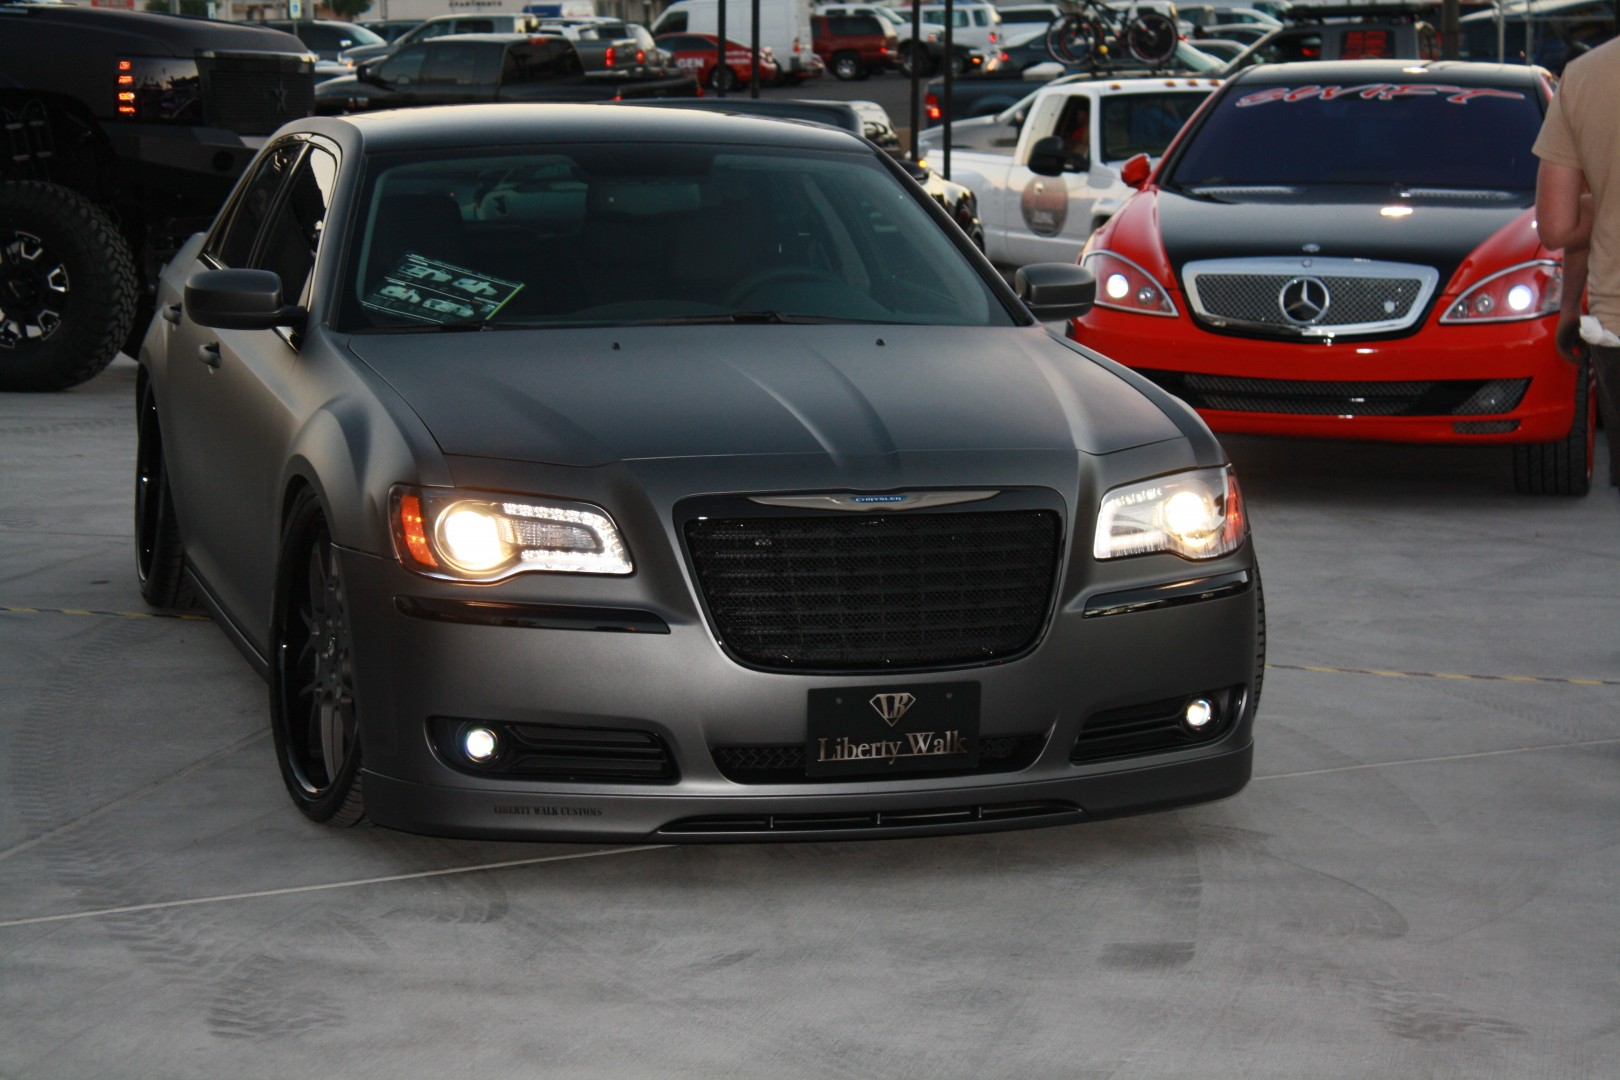 Chrysler 300 Black Wallpaper 3888x2592 Full Hd Wall